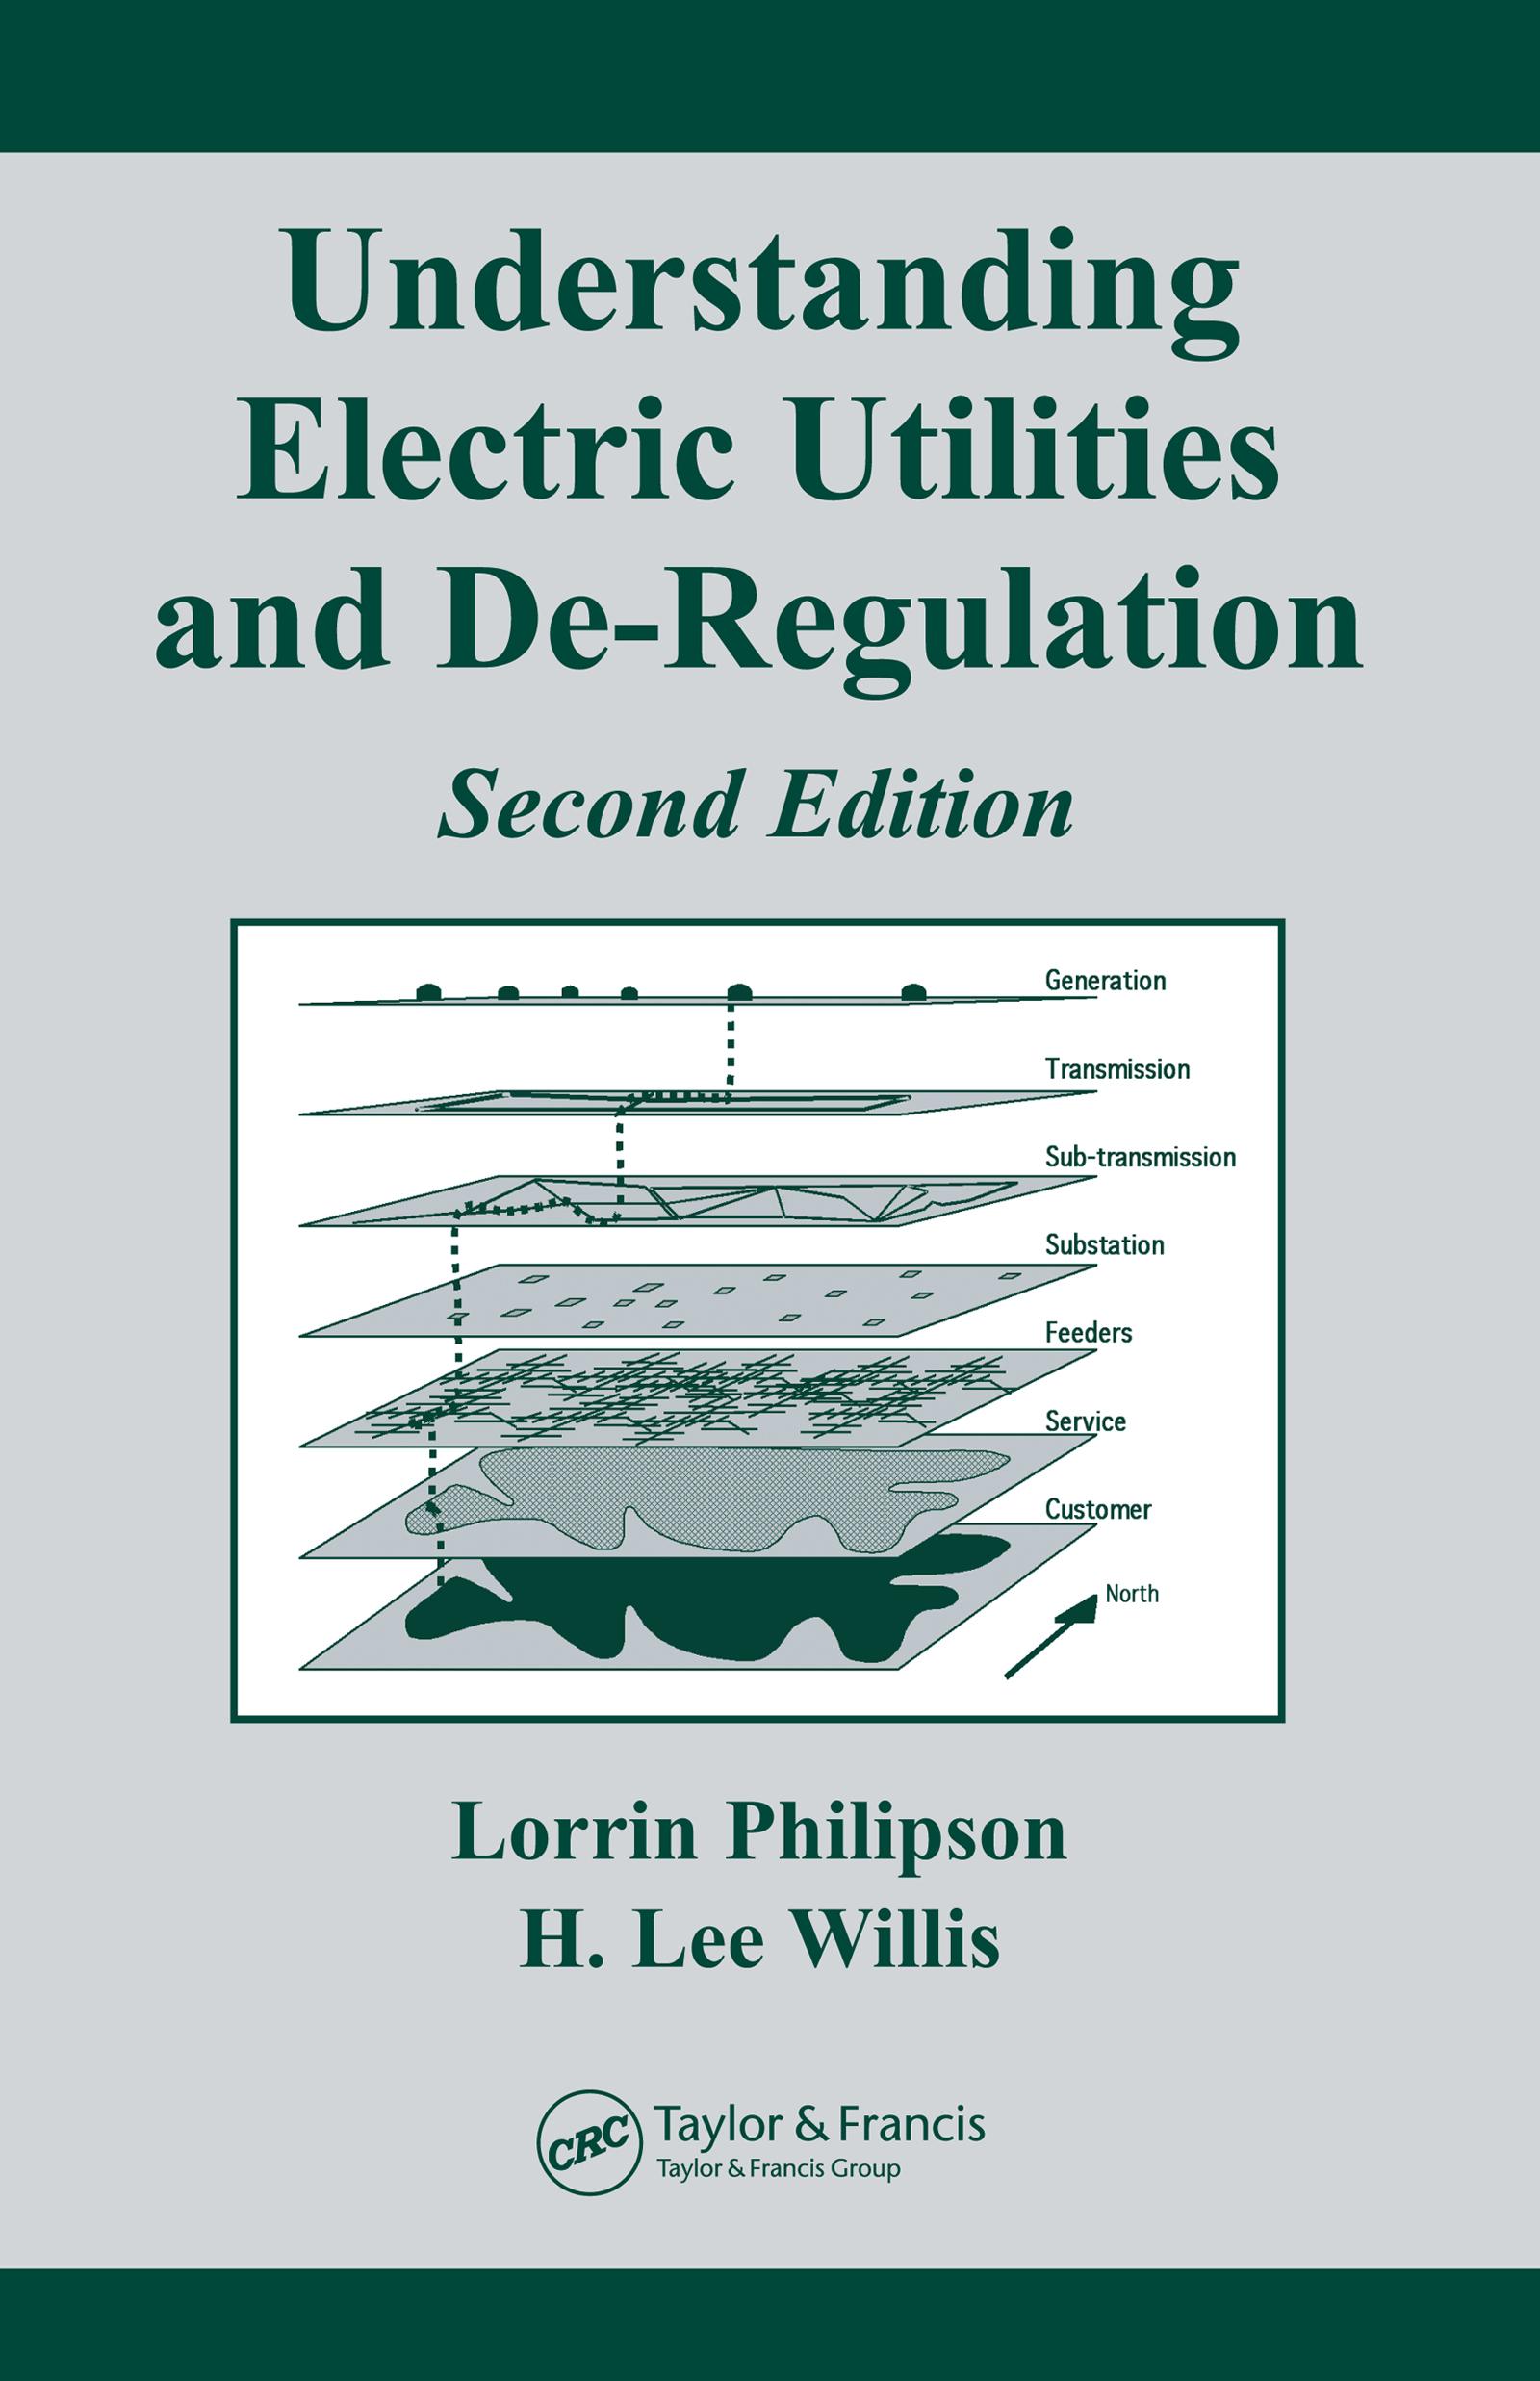 Download Ebook Understanding Electric Utilities and De-Regulation (2nd ed.) by H. Lee Willis Pdf